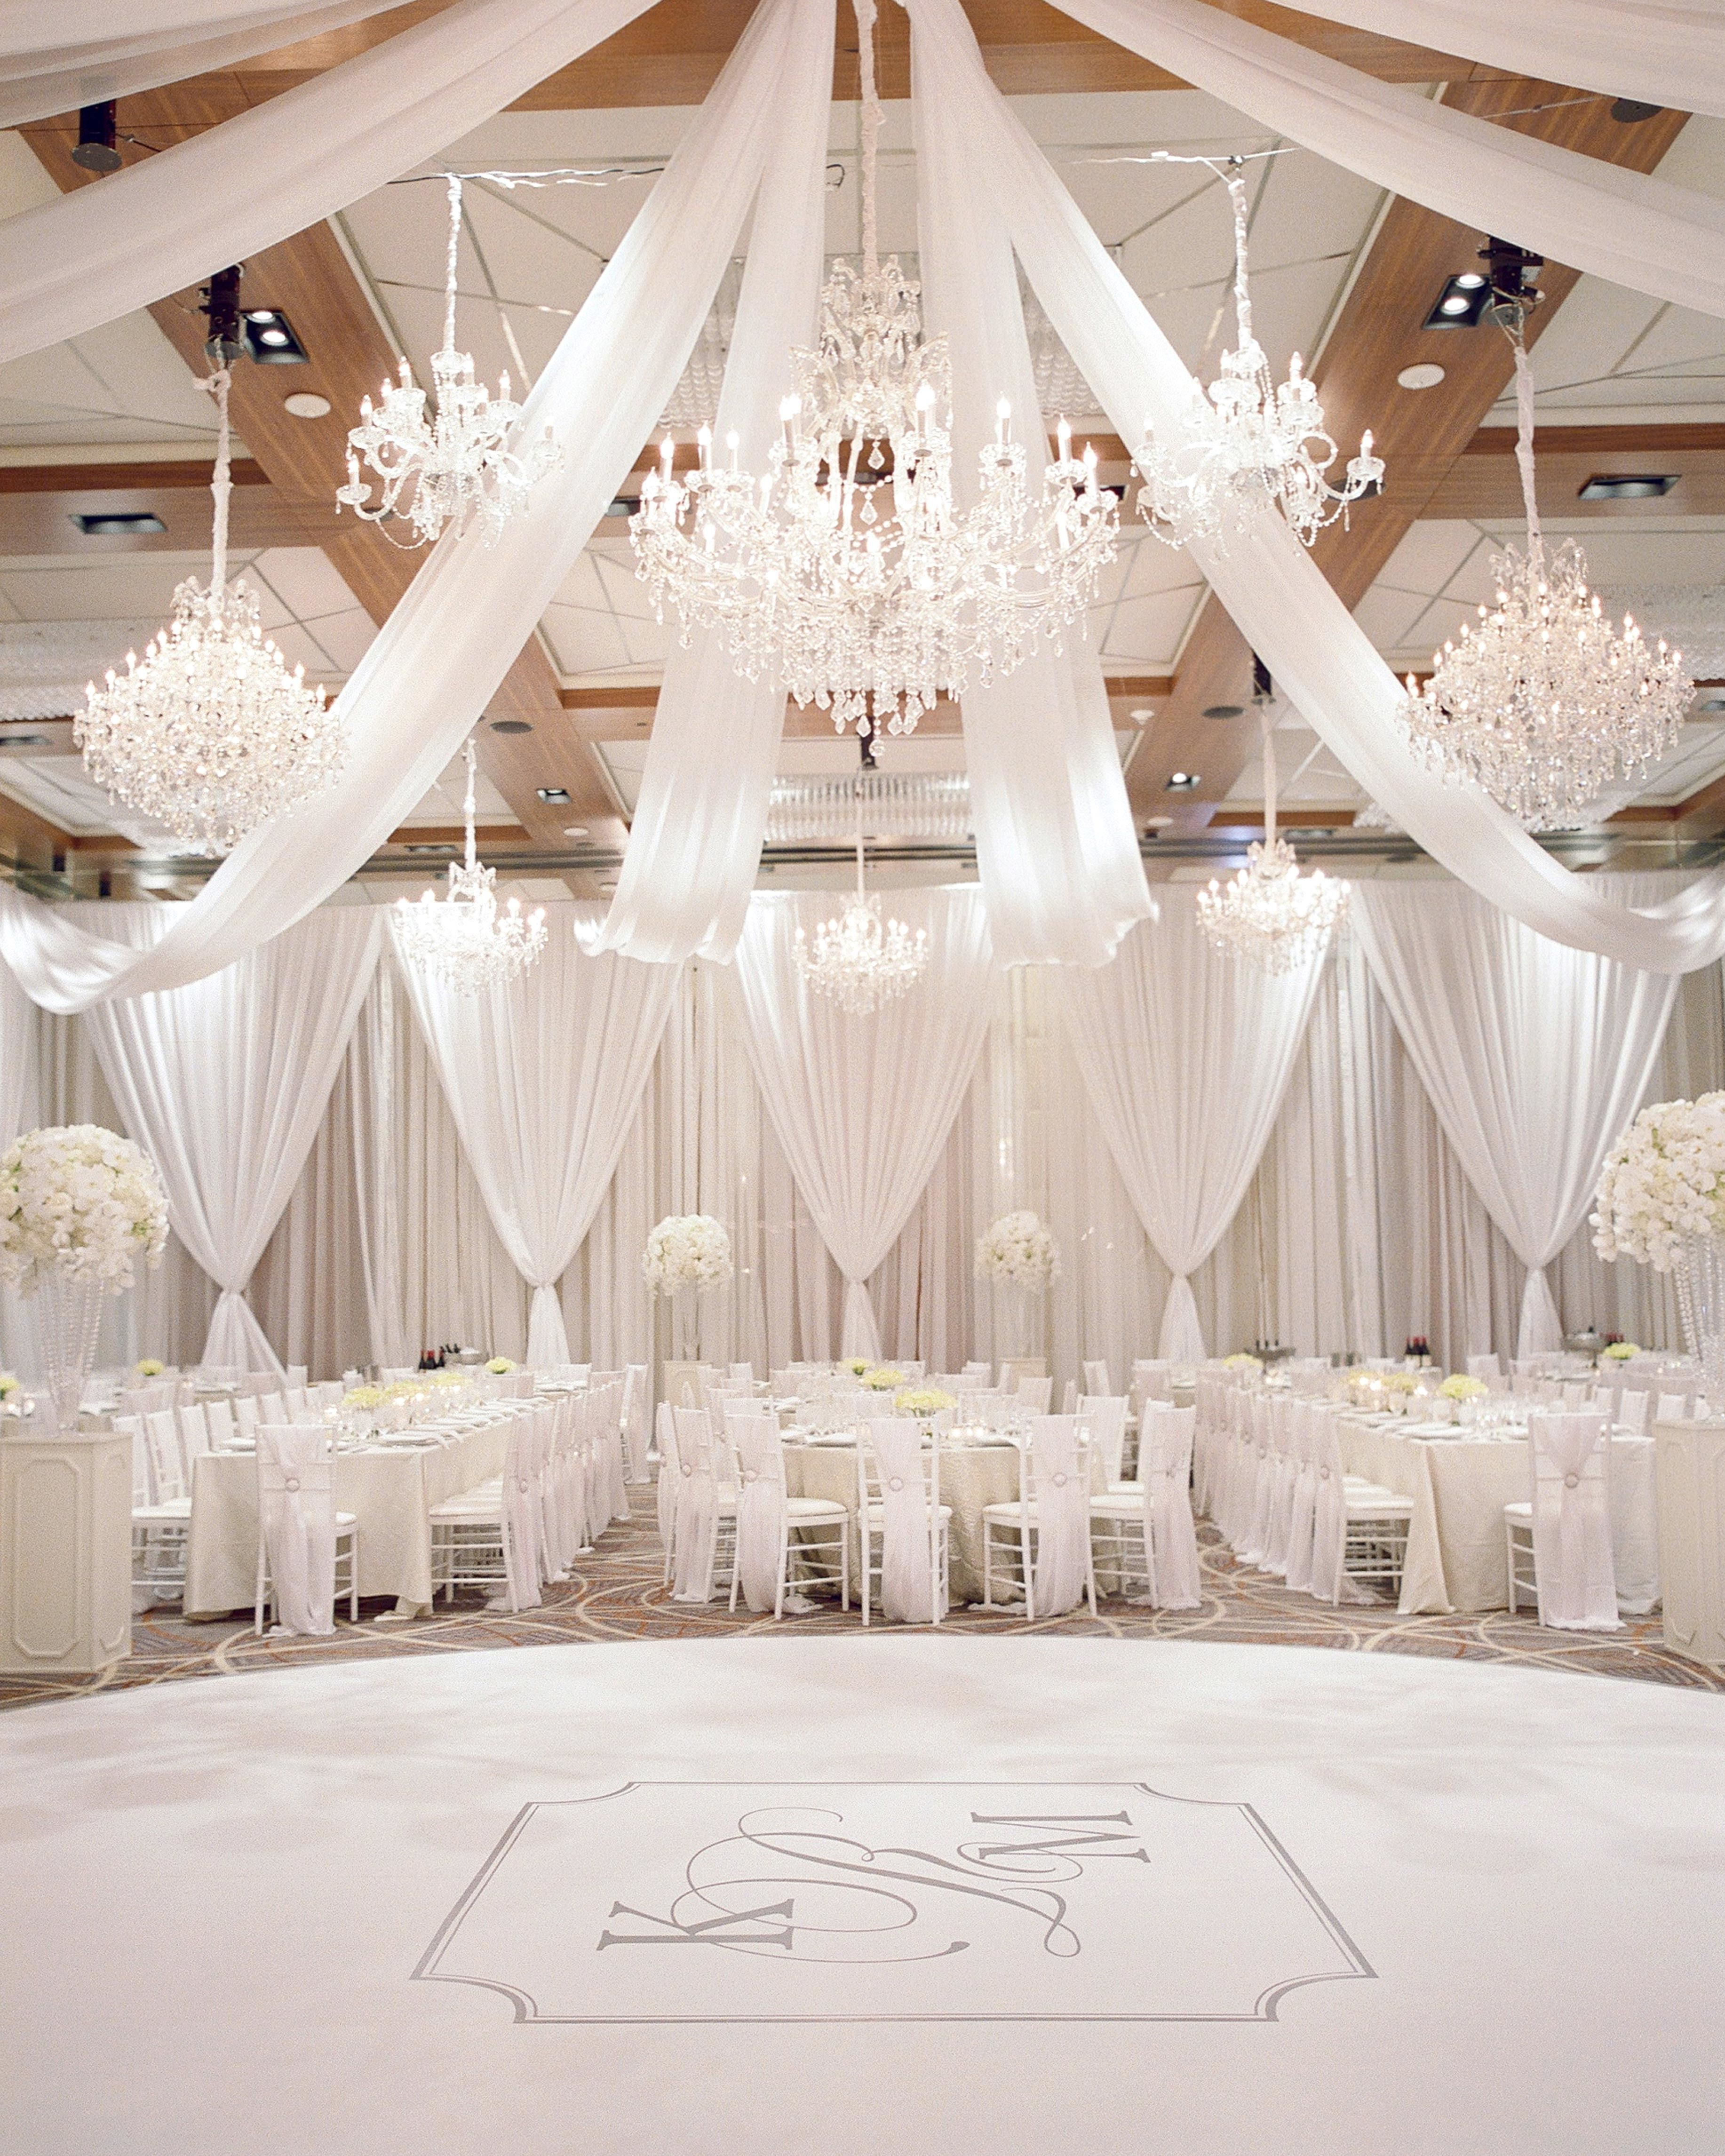 Destination Wedding Reception Ideas: One Couple's Elegant Wedding In Baltimore, Maryland